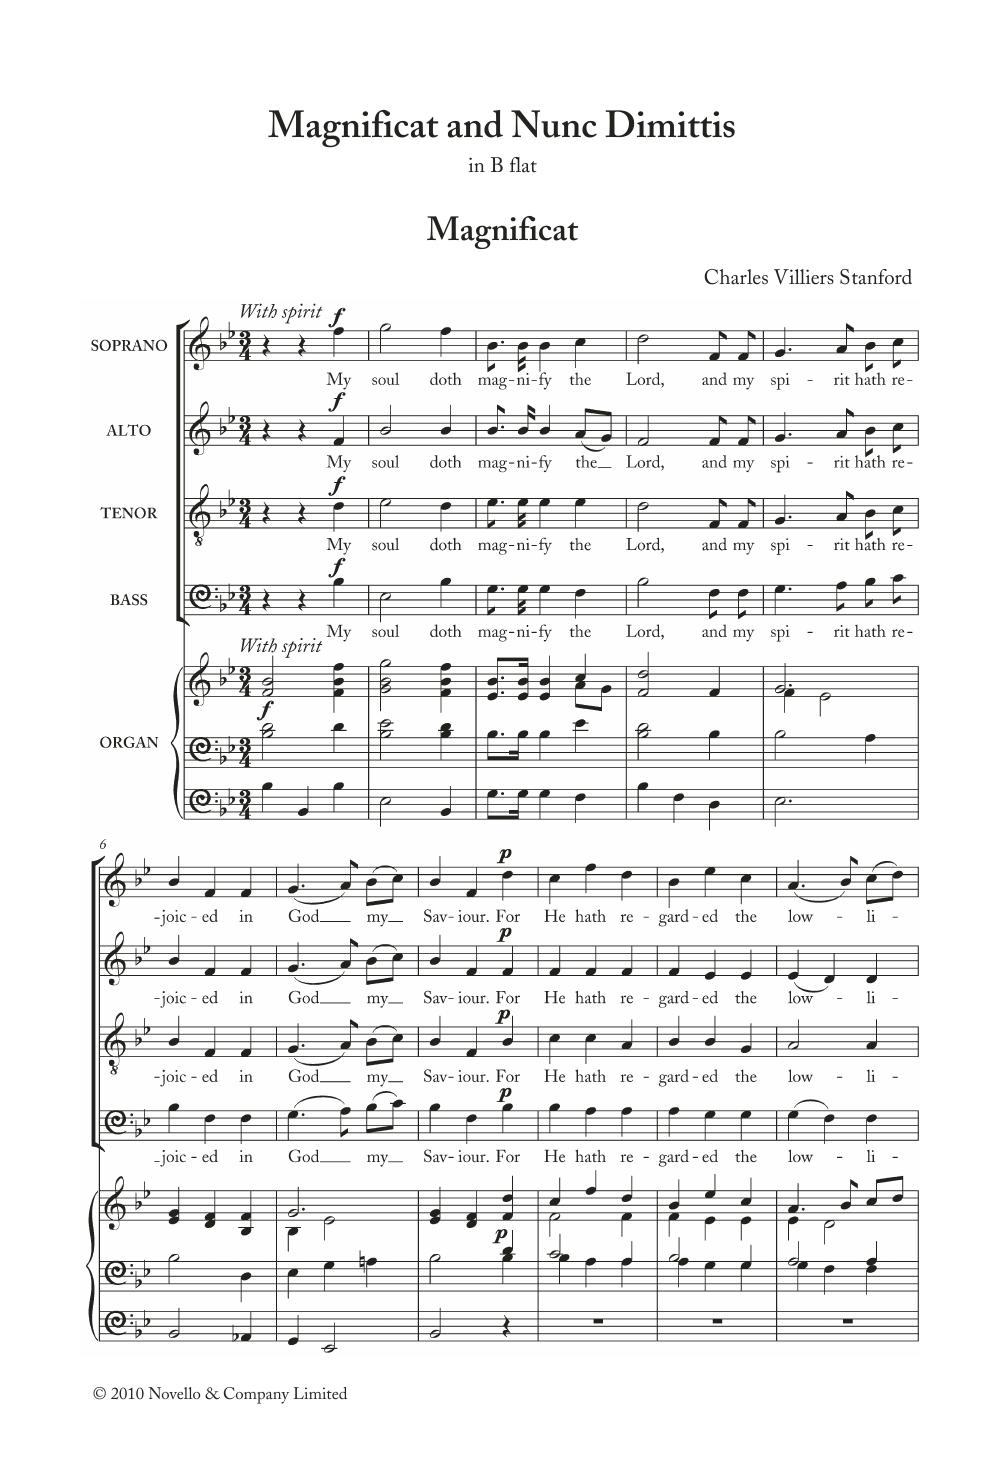 Magnificat And Nunc Dimittis In B Flat Sheet Music